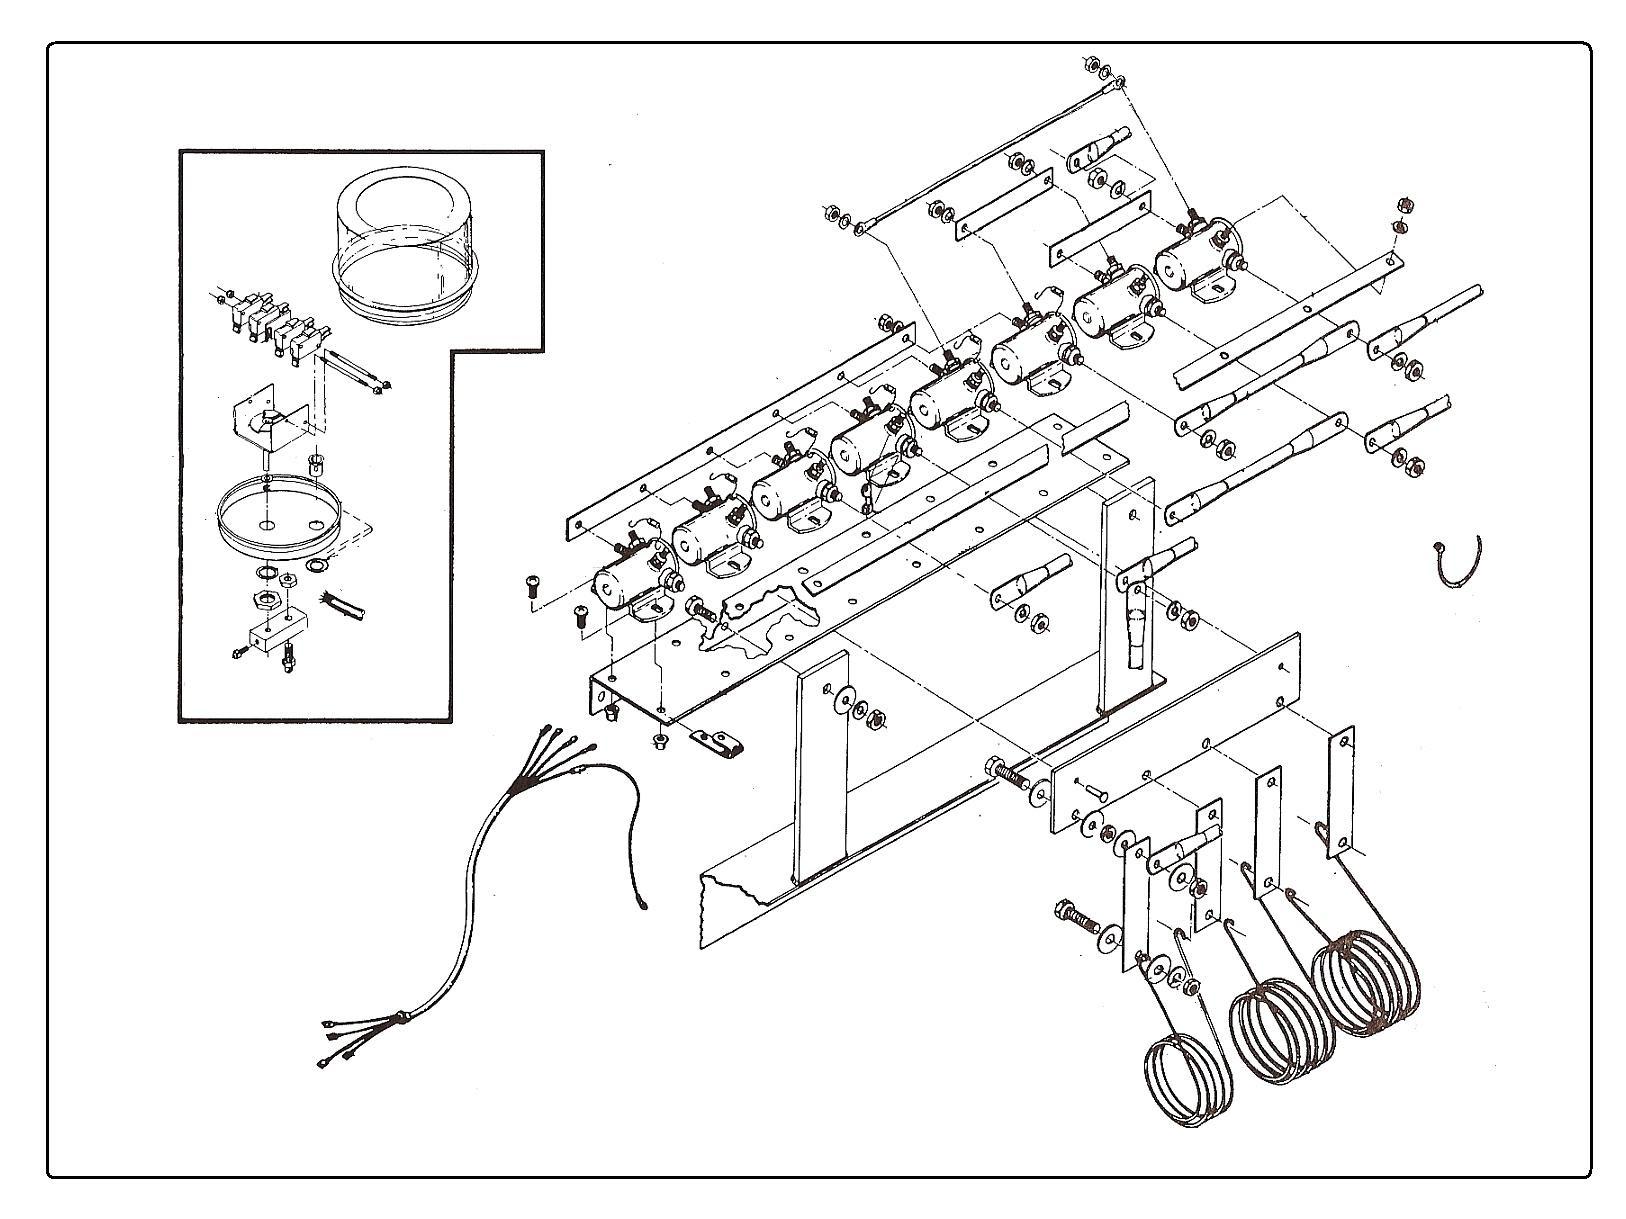 36v battery wiring diagram